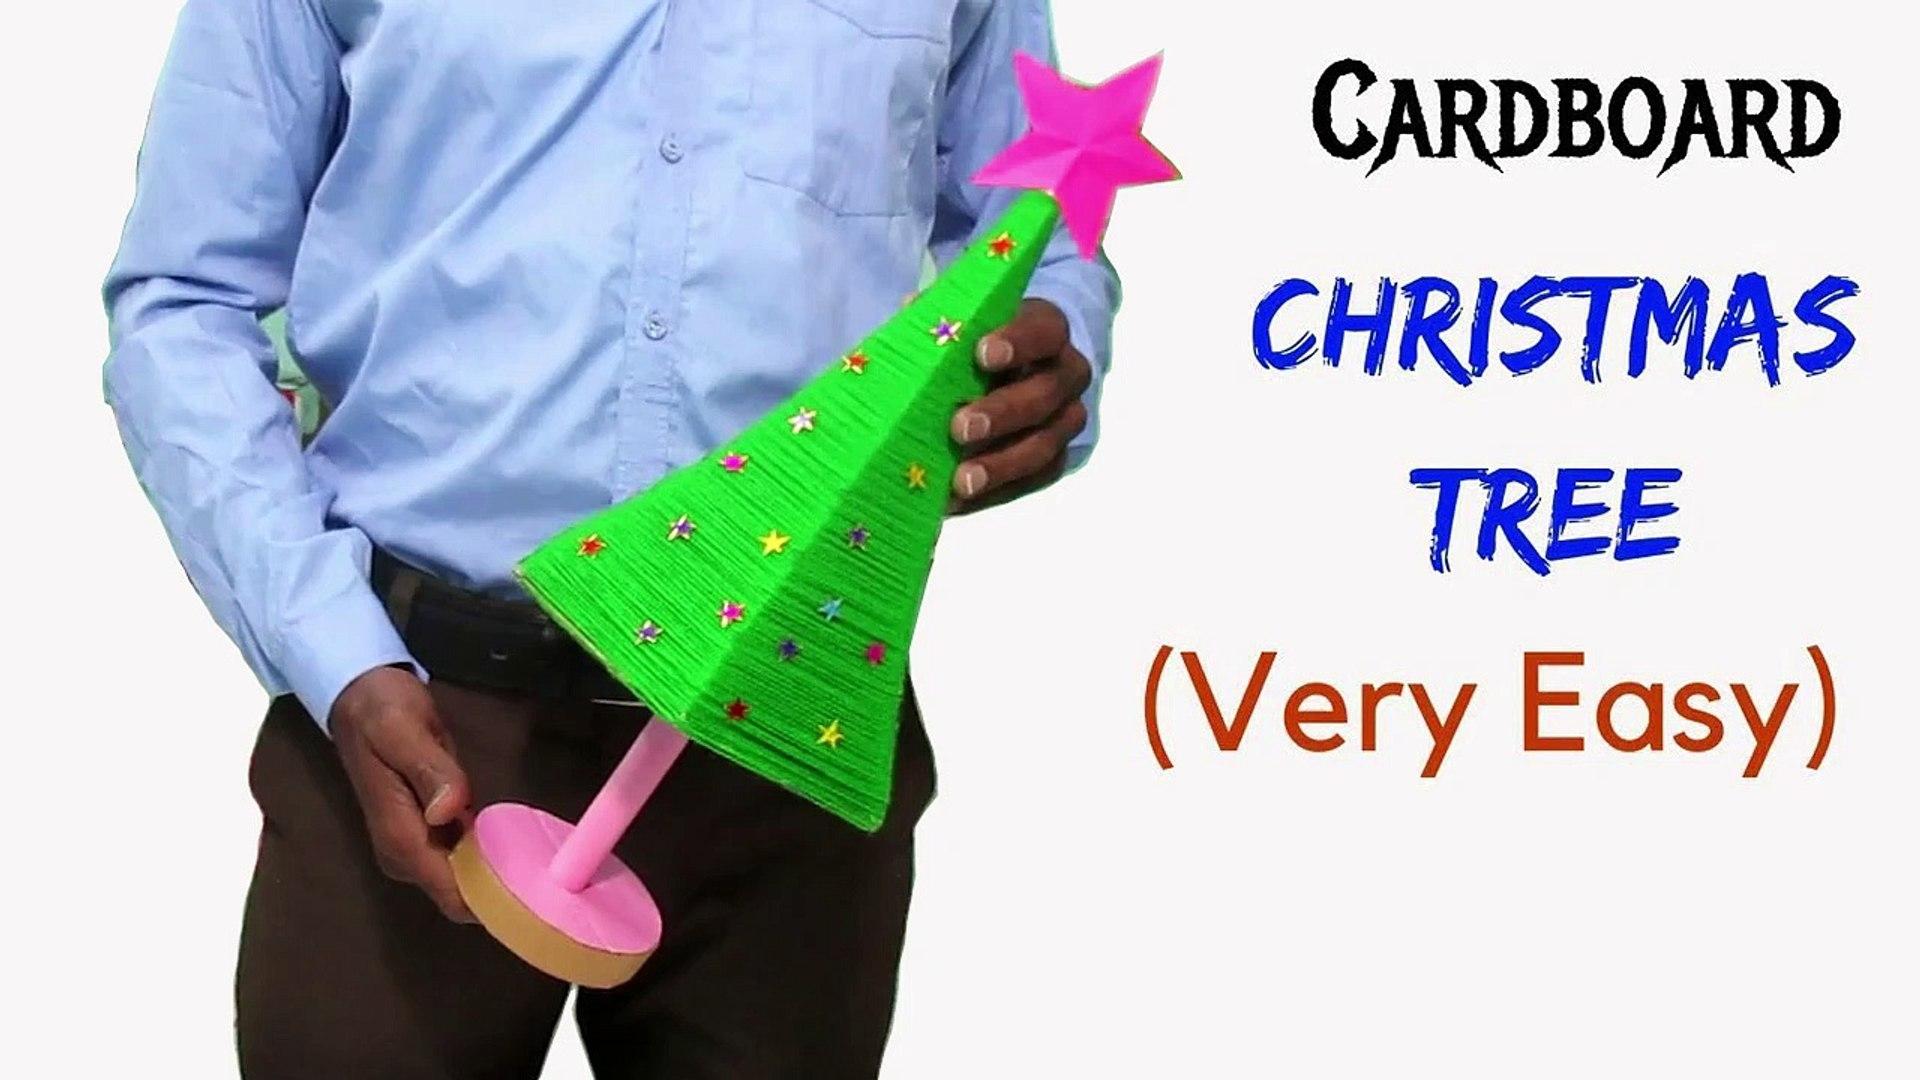 DIY Christmas Tree Using Cardboard   How to Make Christmas Tree   Cardboard Christmas Tree   Christm